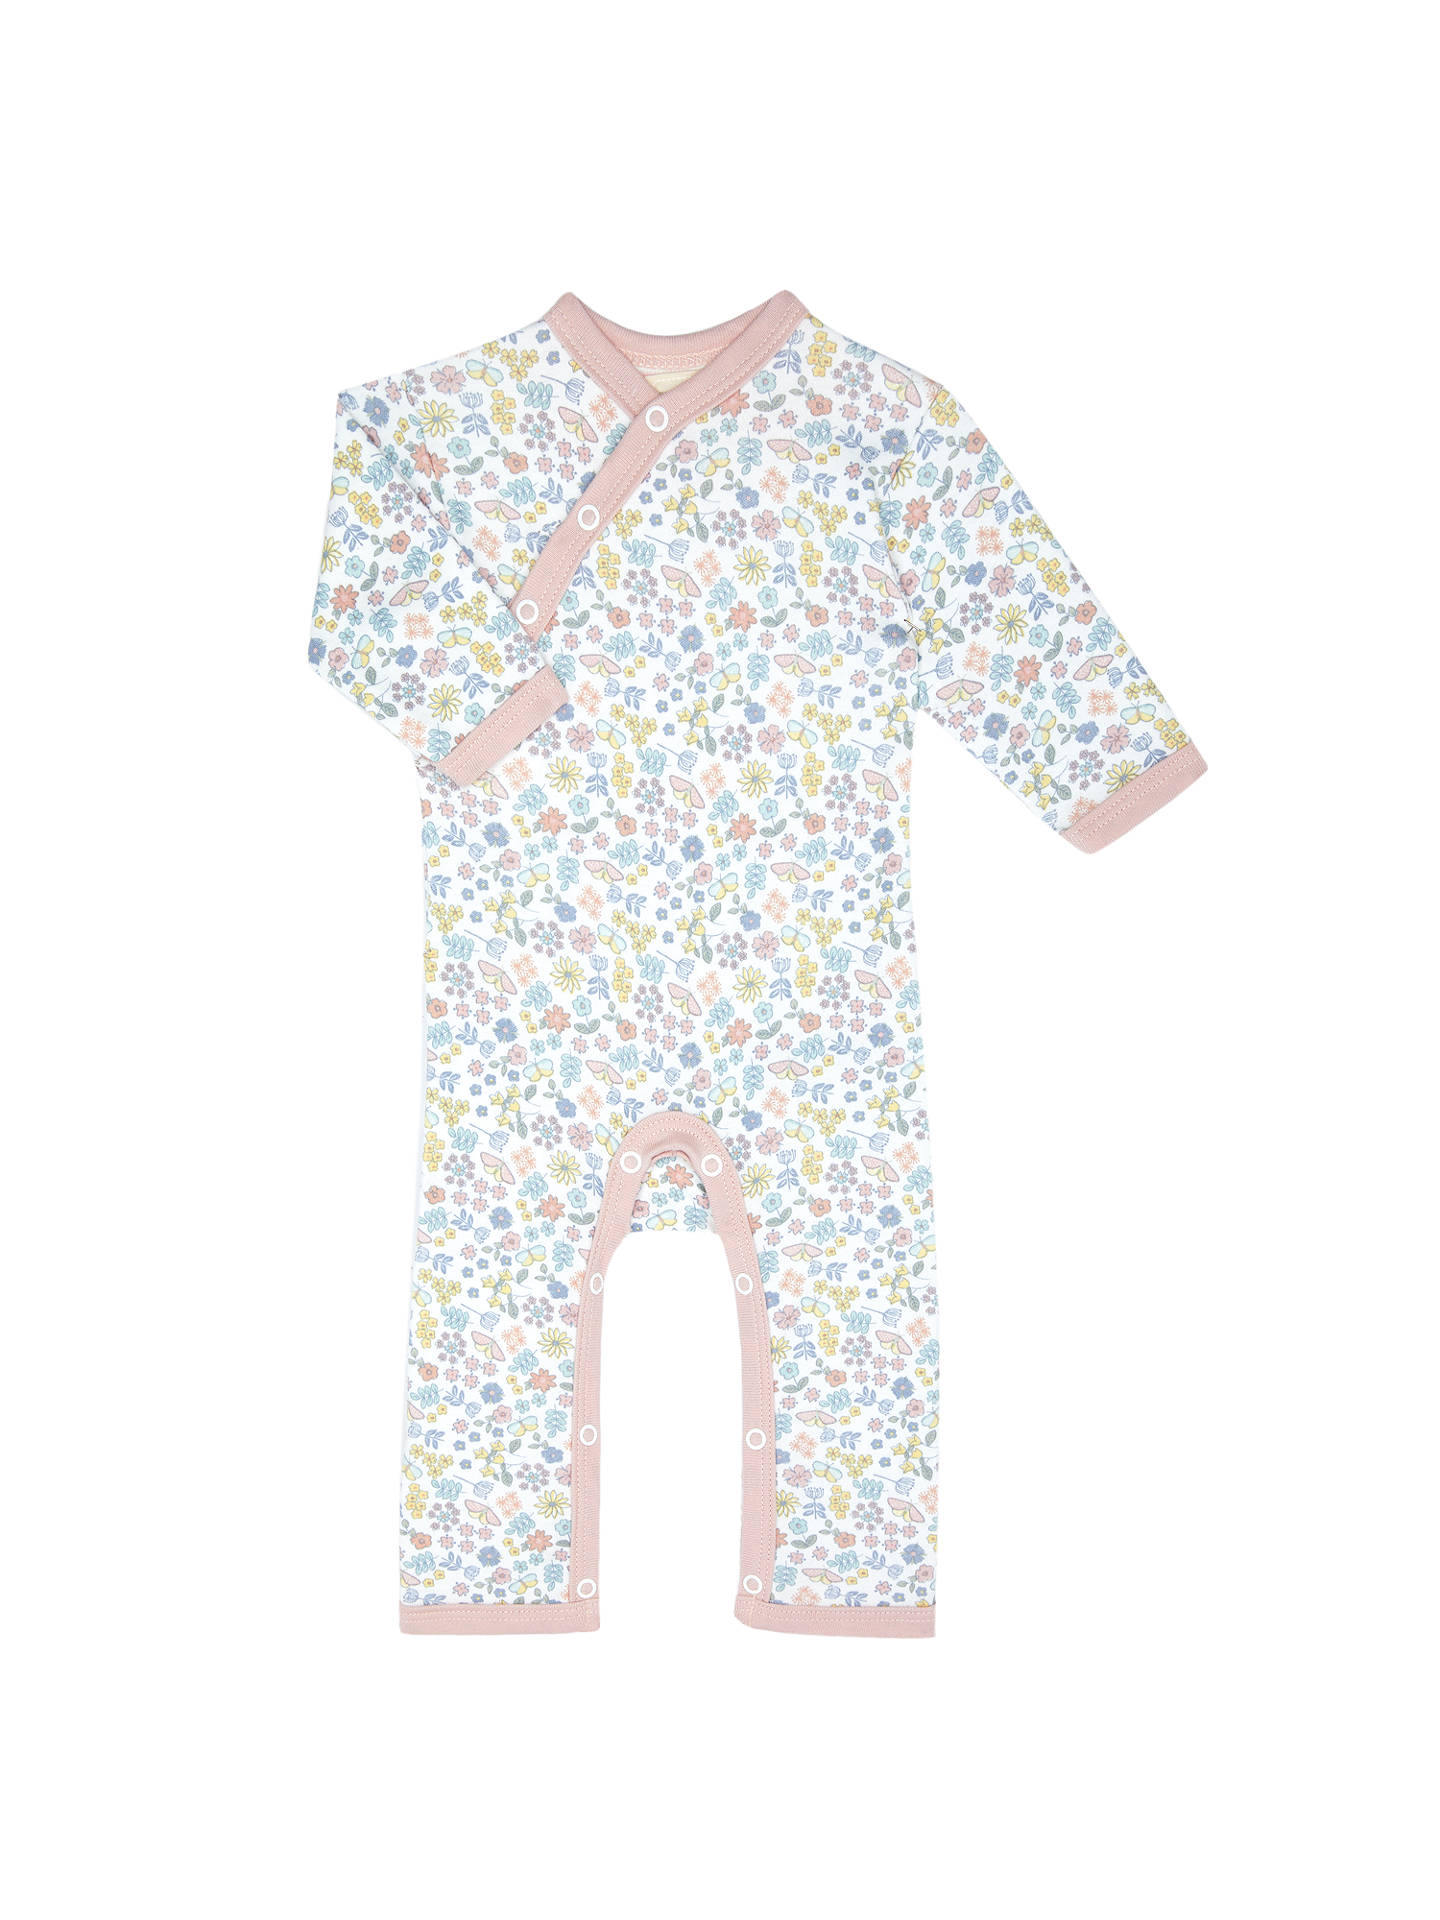 0e205dcb7 wholesale price 76922 36c1f buyjohn lewis baby zebra print short ...